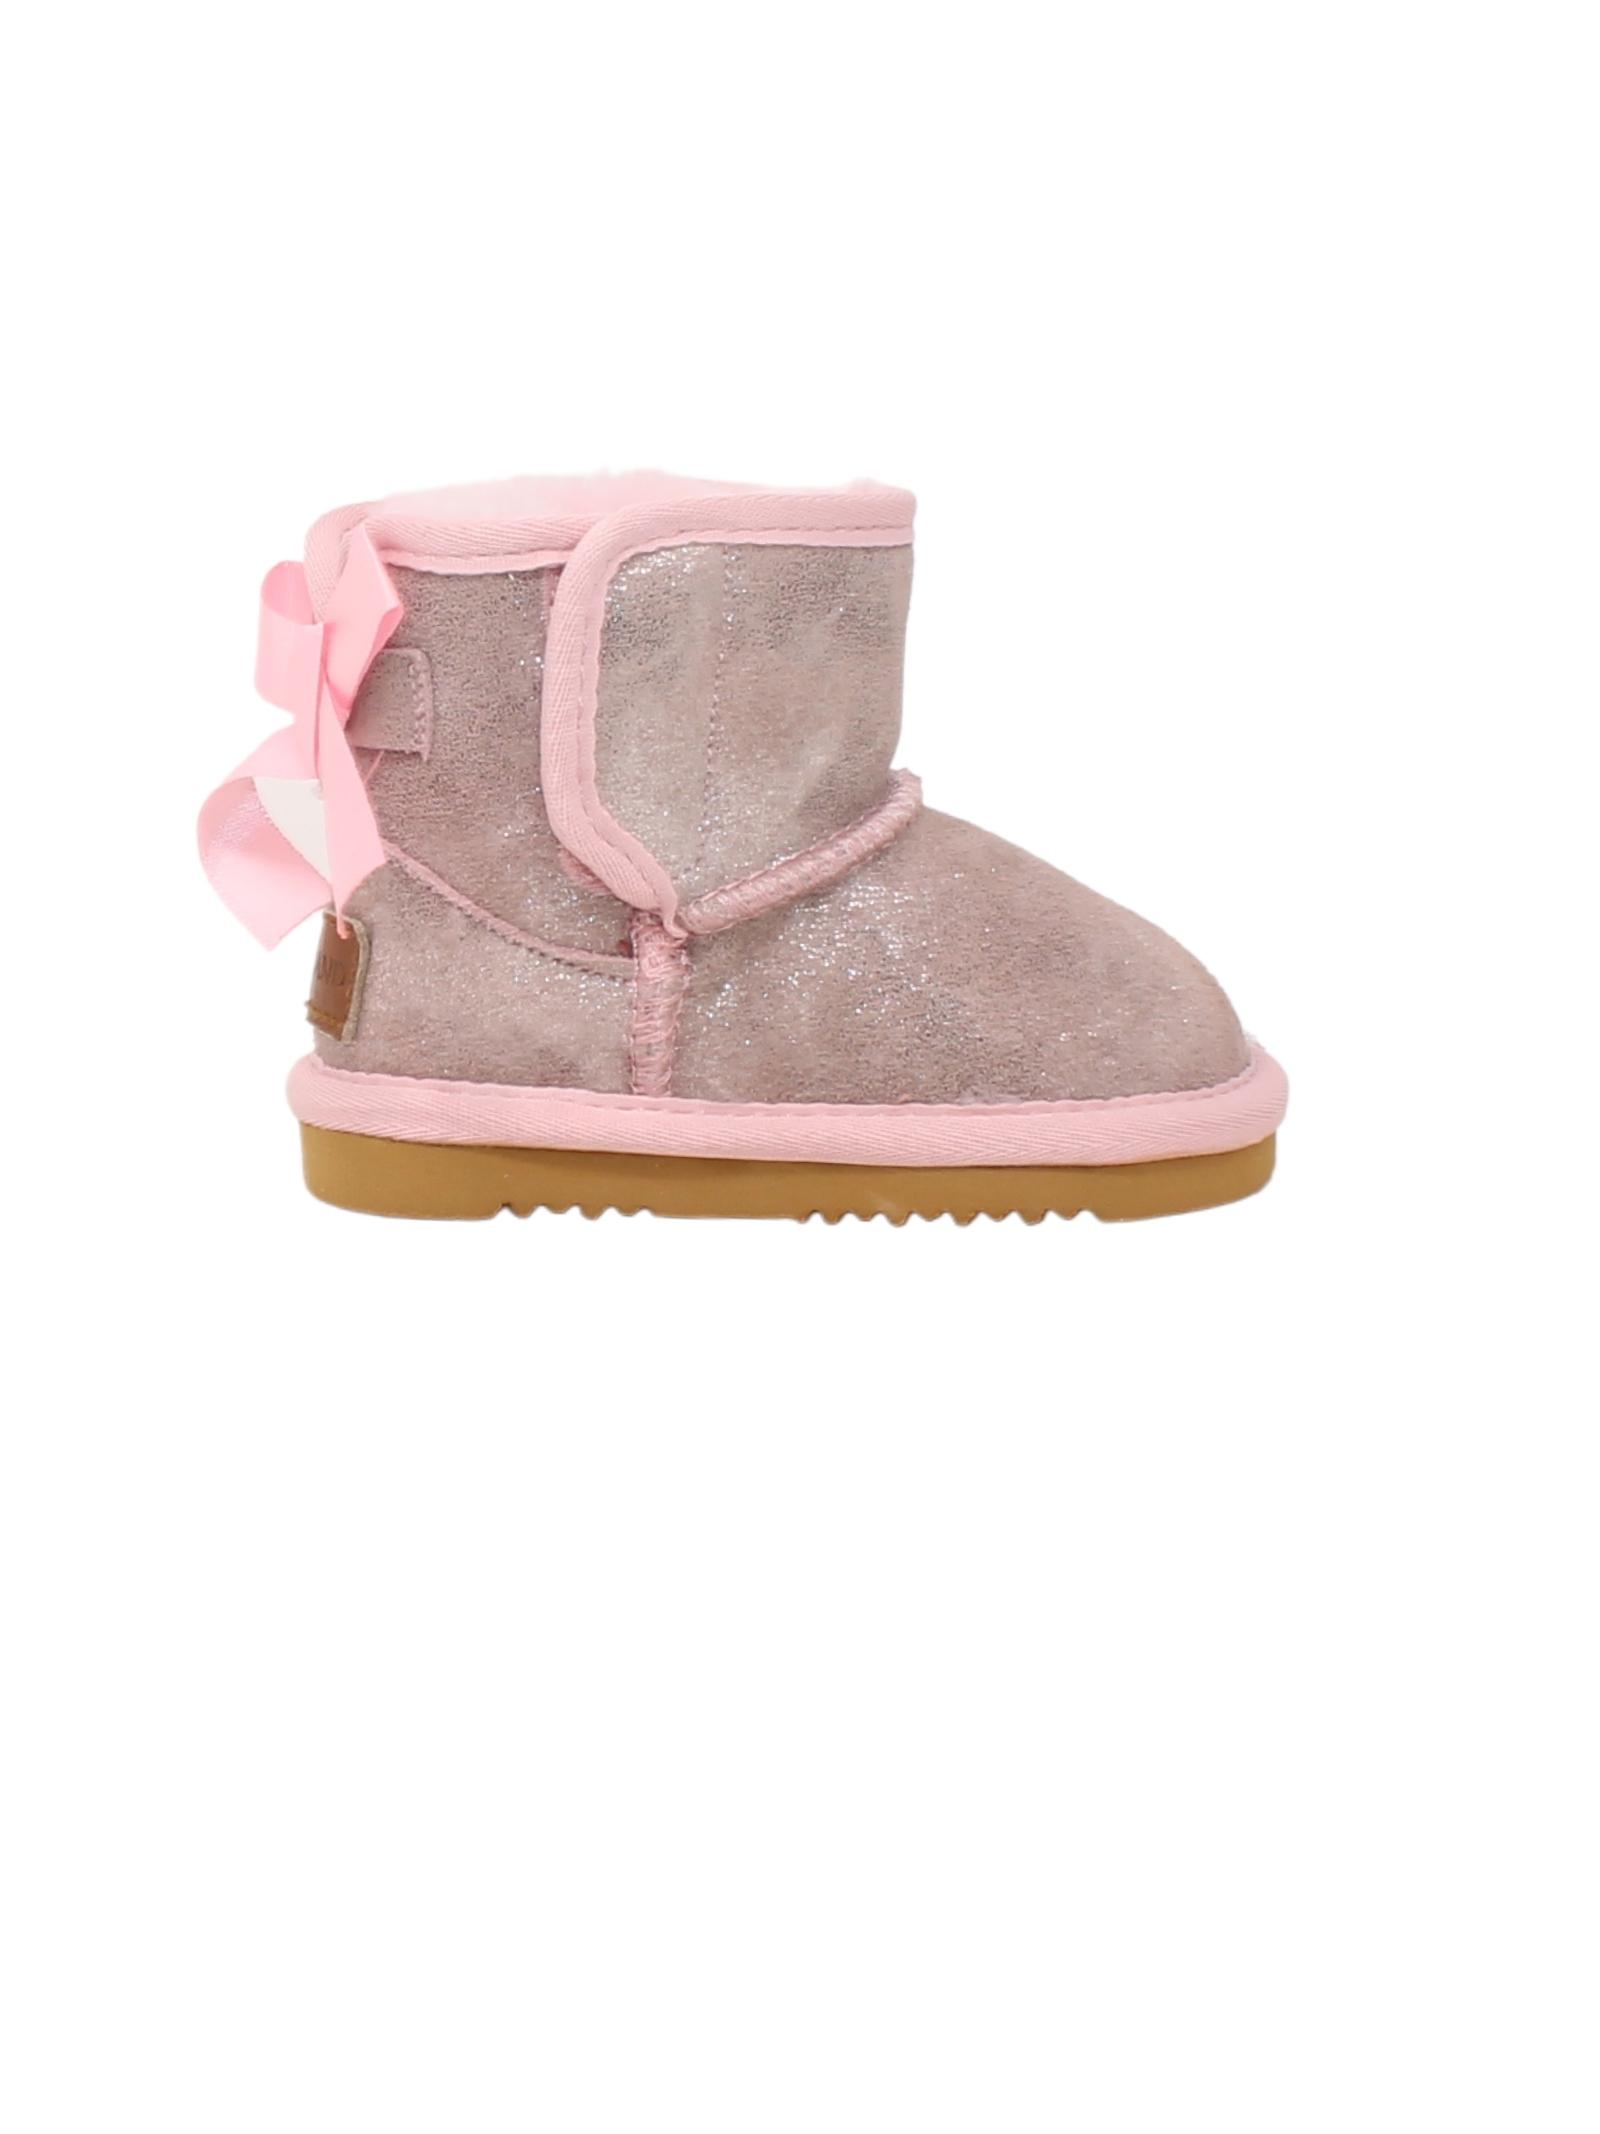 Tronchetti Croy Effetto Lurex Pink Bambina GRUNLAND JUNIOR   Tronchetti   0061ROSA